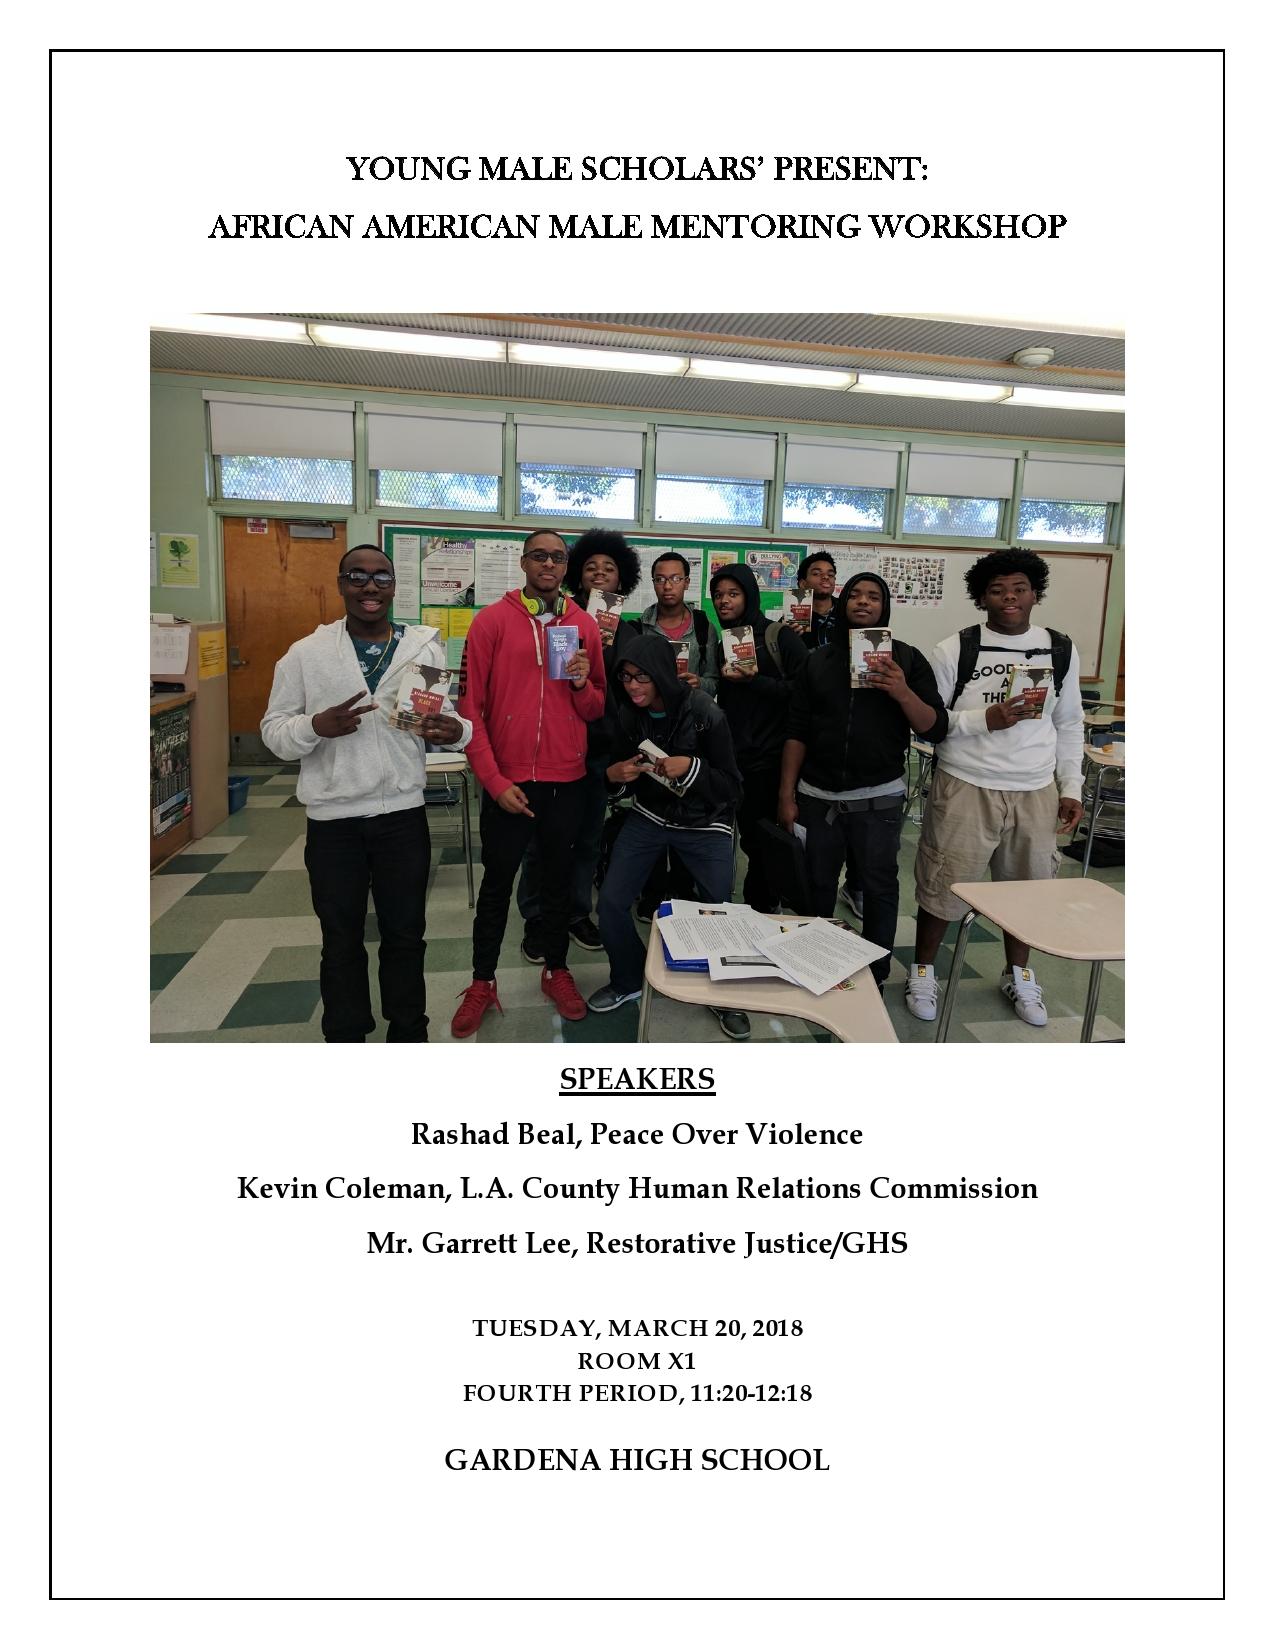 Black male workshop flyer 2018.jpg